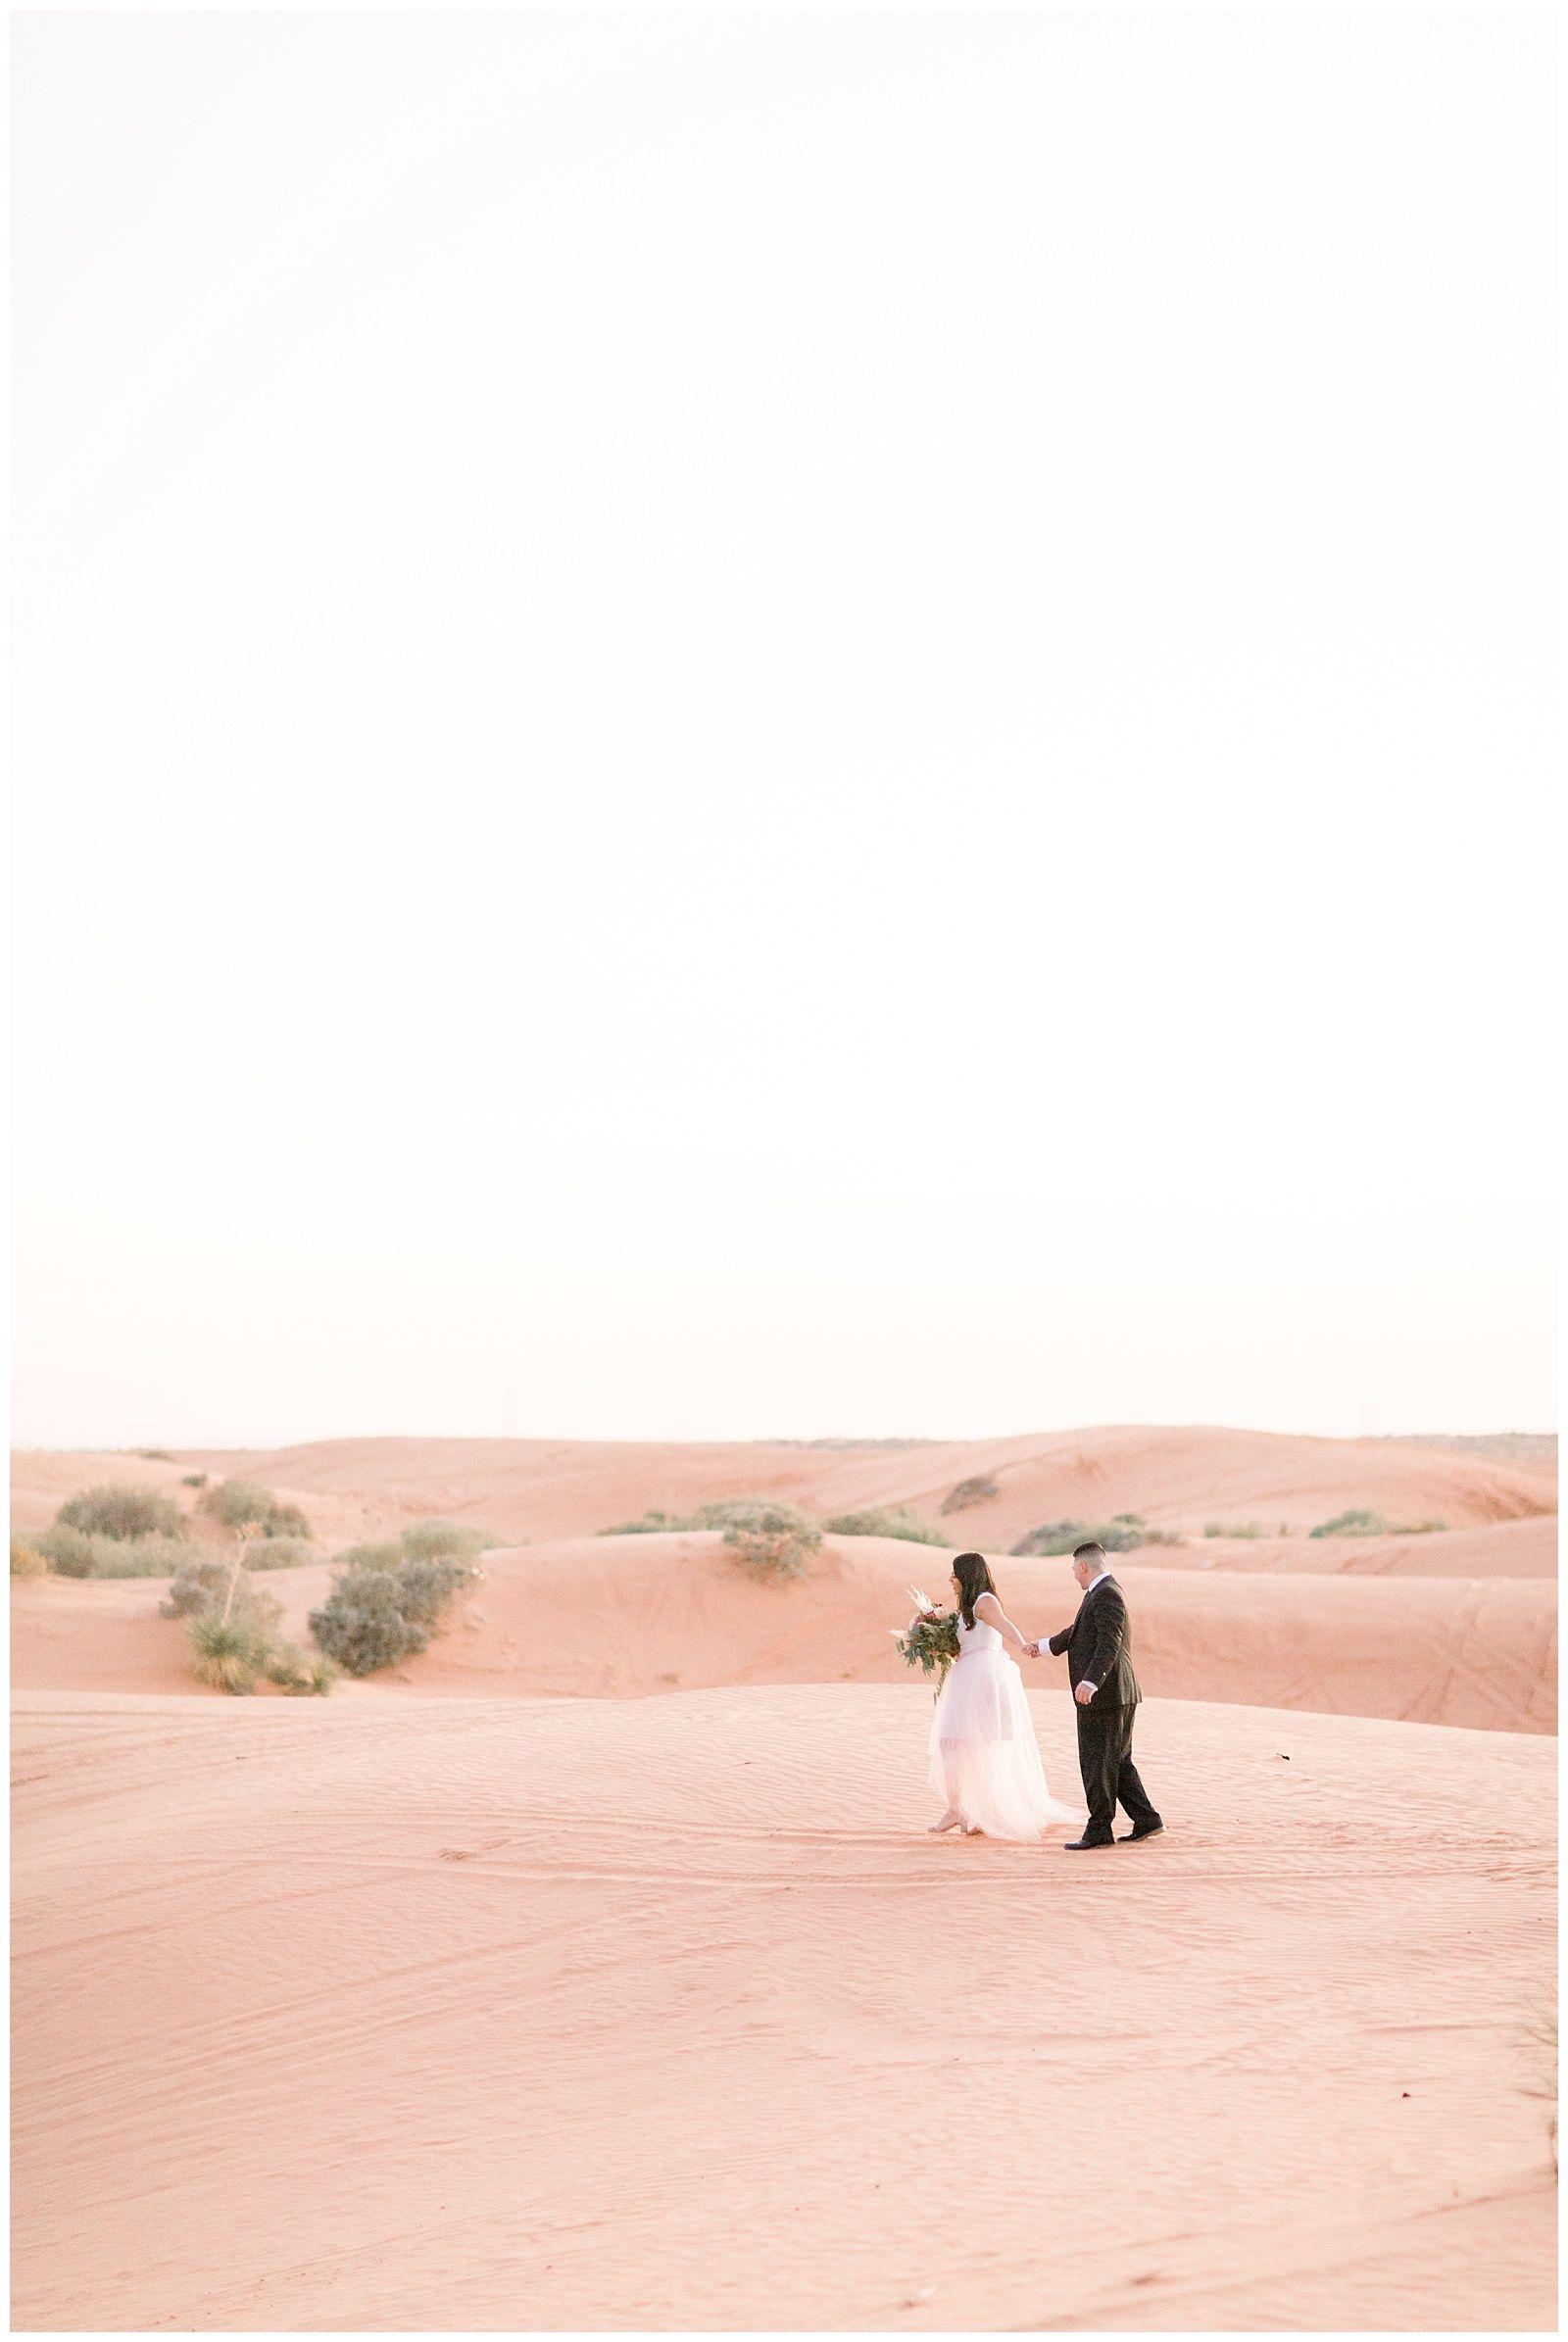 Red Sands El Paso Tx Yasmin Jered Jaz Theo El Paso Texas Wedding Wedding Venues Texas El Paso Texas Photography